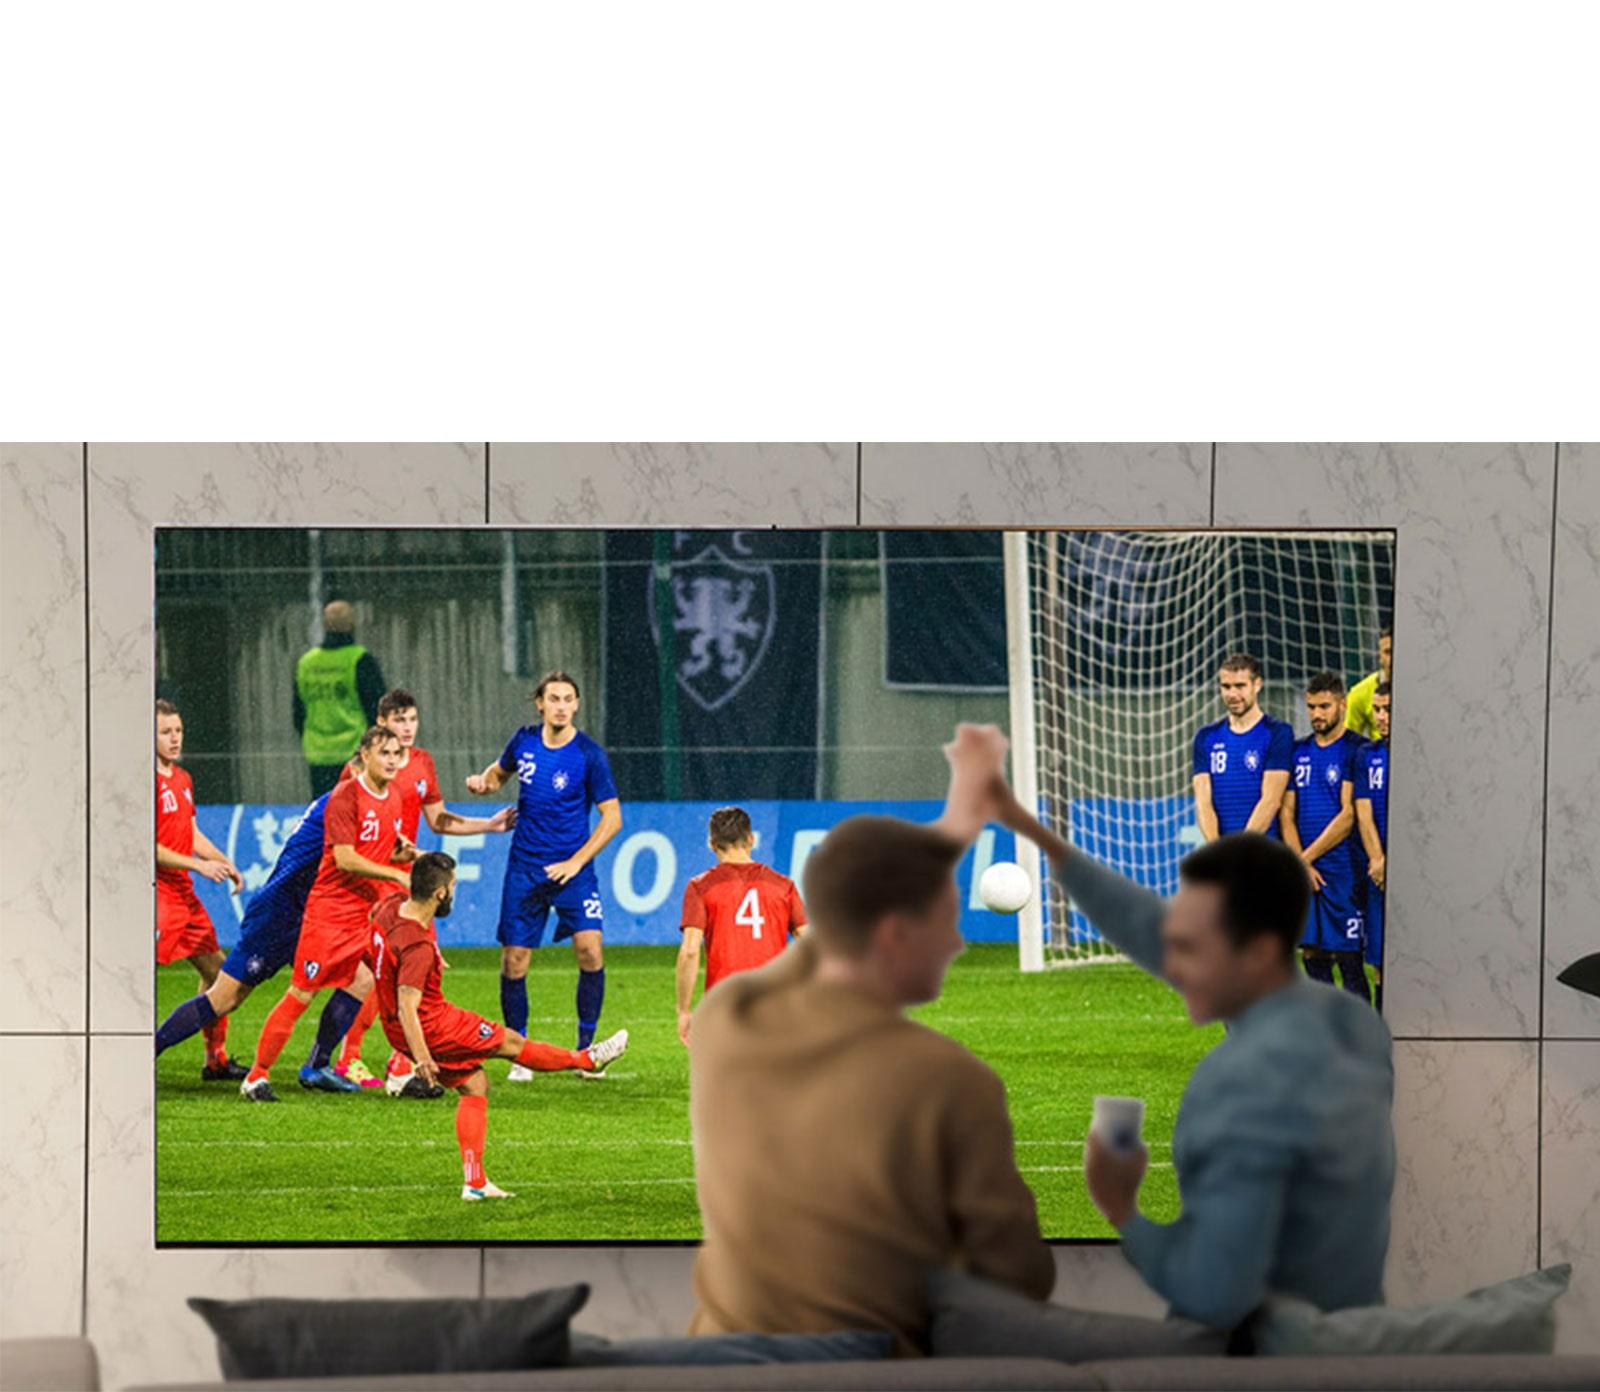 Orang menyaksikan pertandingan olahraga pada TV di sebuah ruang tamu dengan TV layar besar